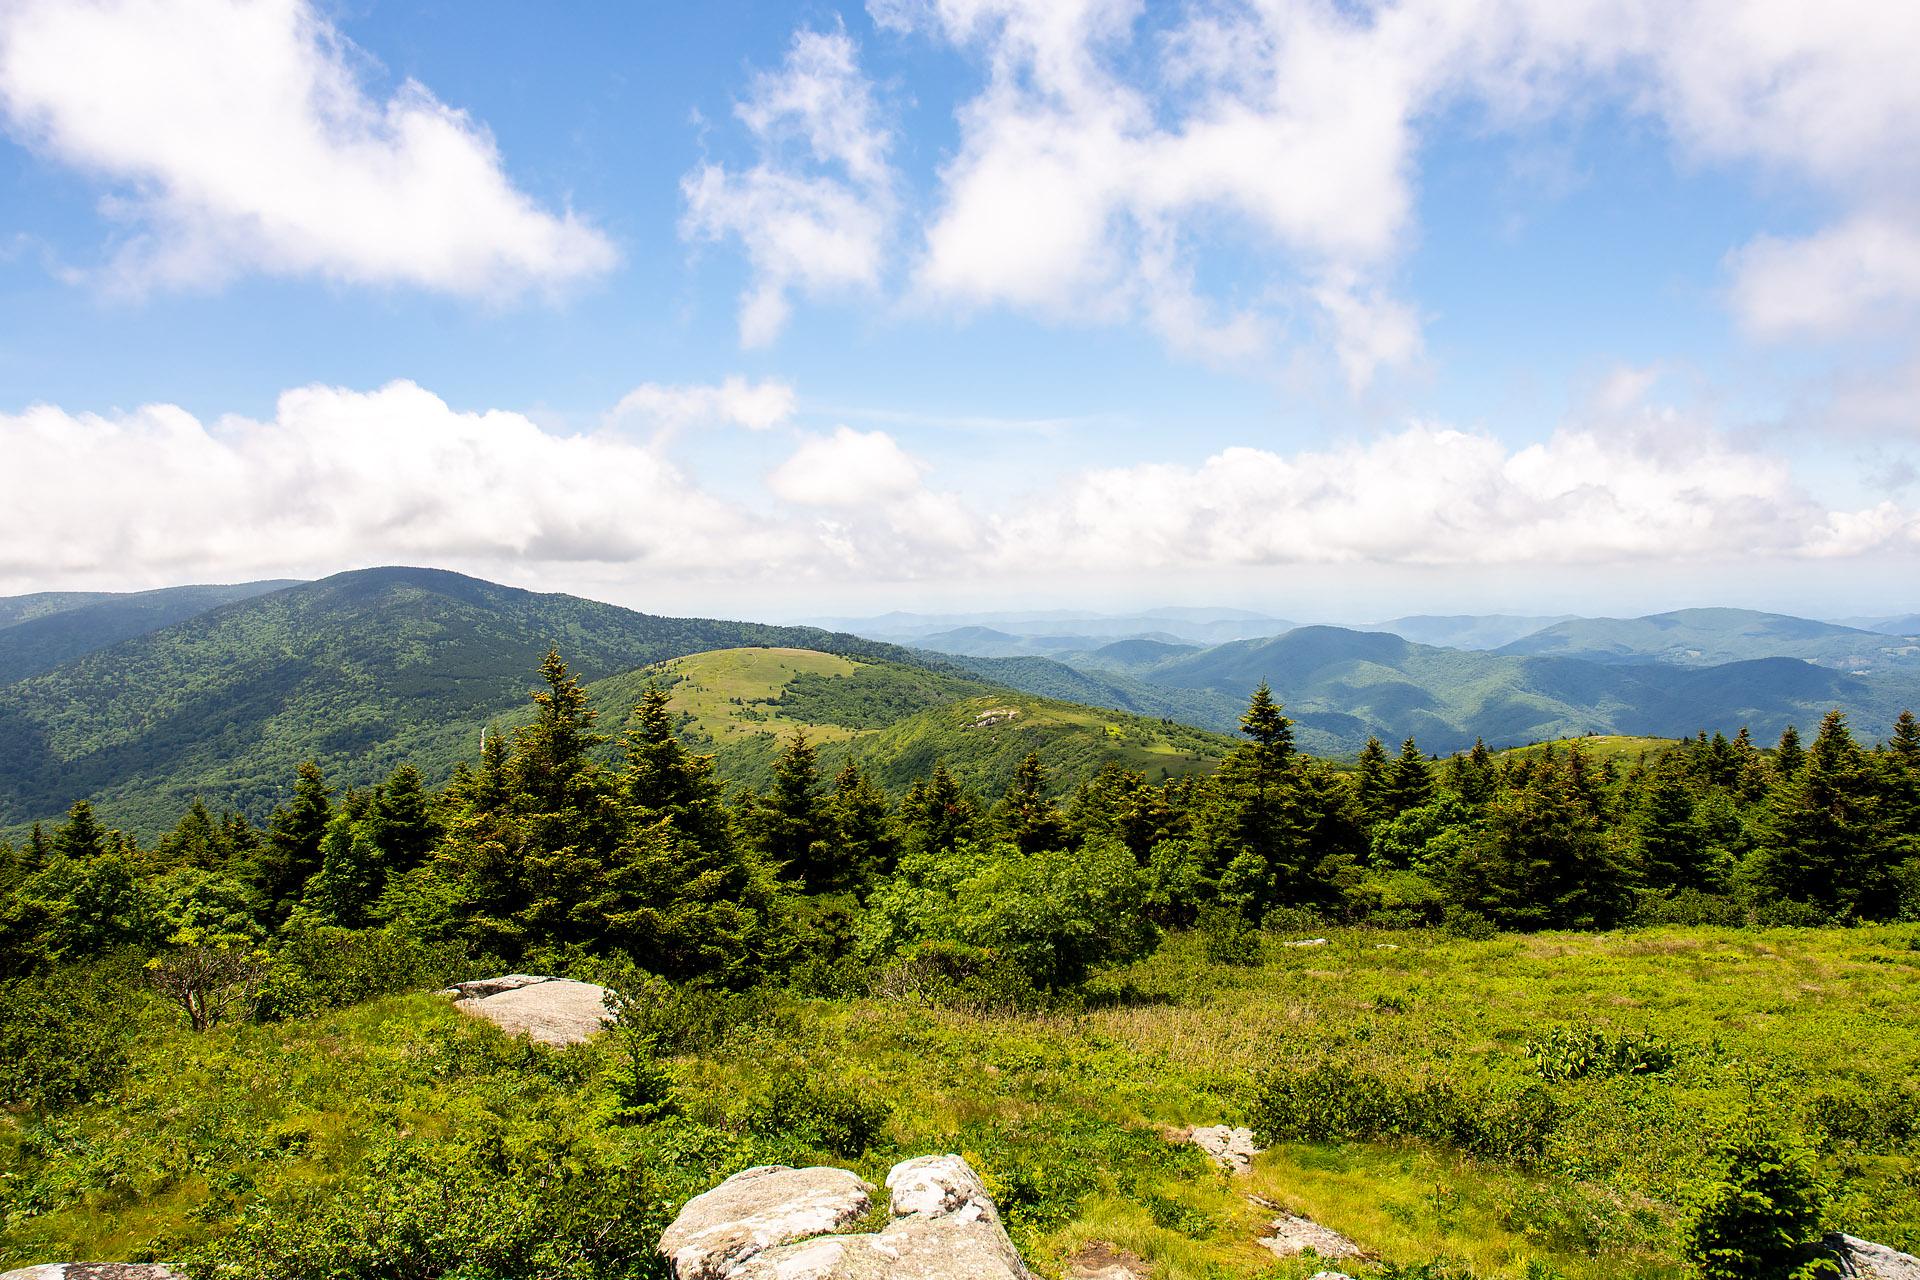 View from Grassy Ridge Bald